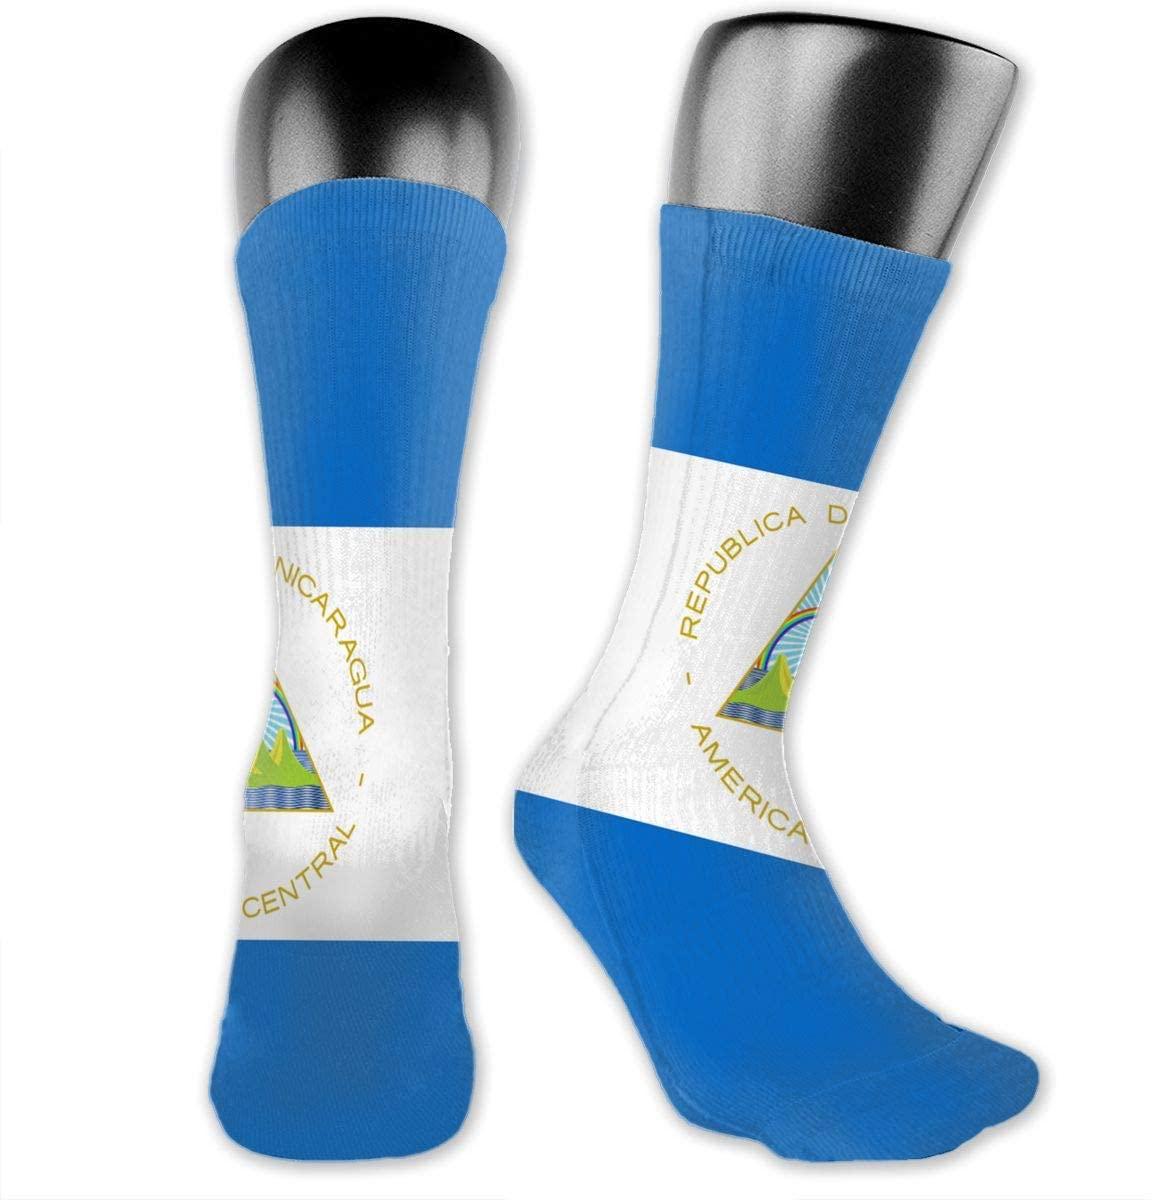 Flag of Nicaragua Unisex Outdoor Long Socks Sport Athletic Crew Socks Stockings